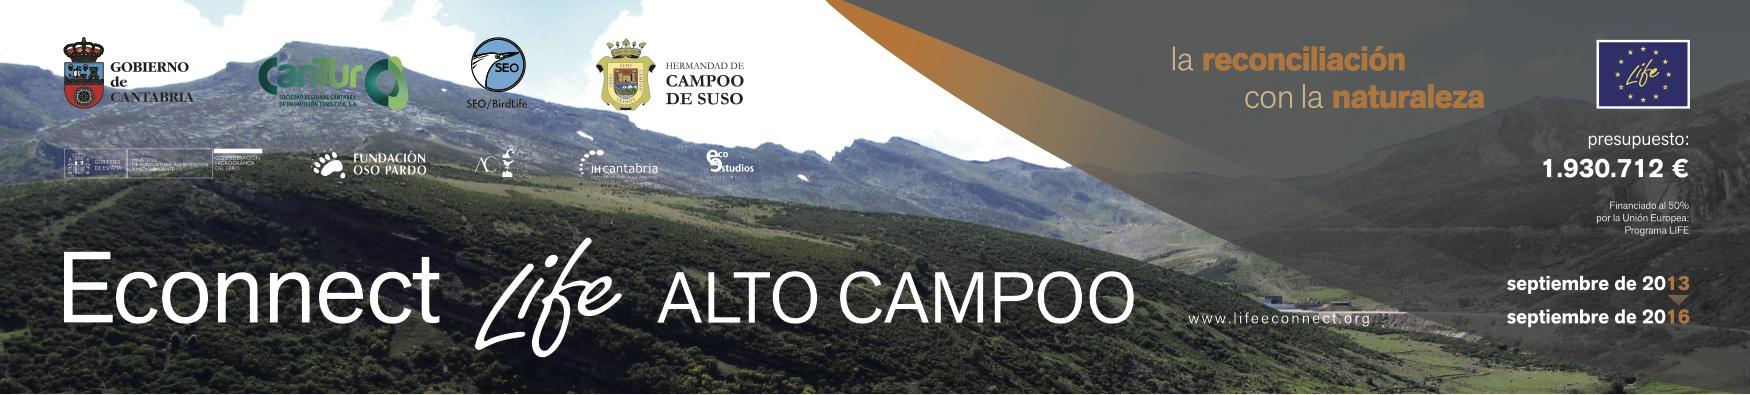 Patrocinadores Life Econnect Alto Campoo